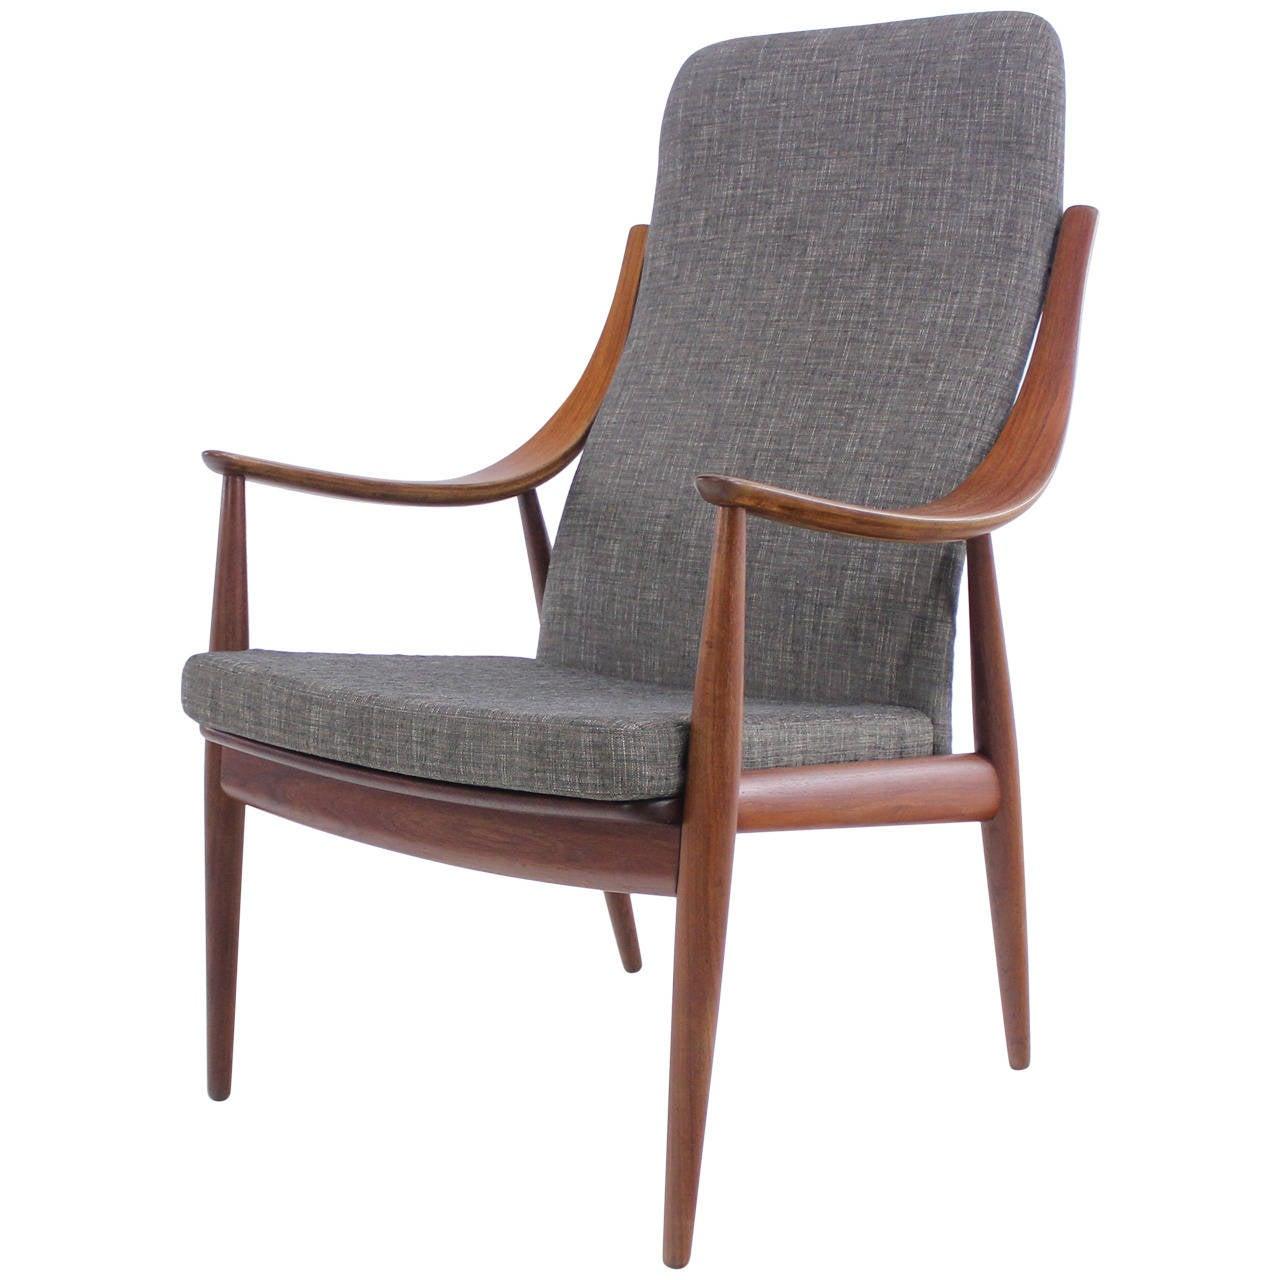 danish modern teak armchair designed by peter hvidt at 1stdibs